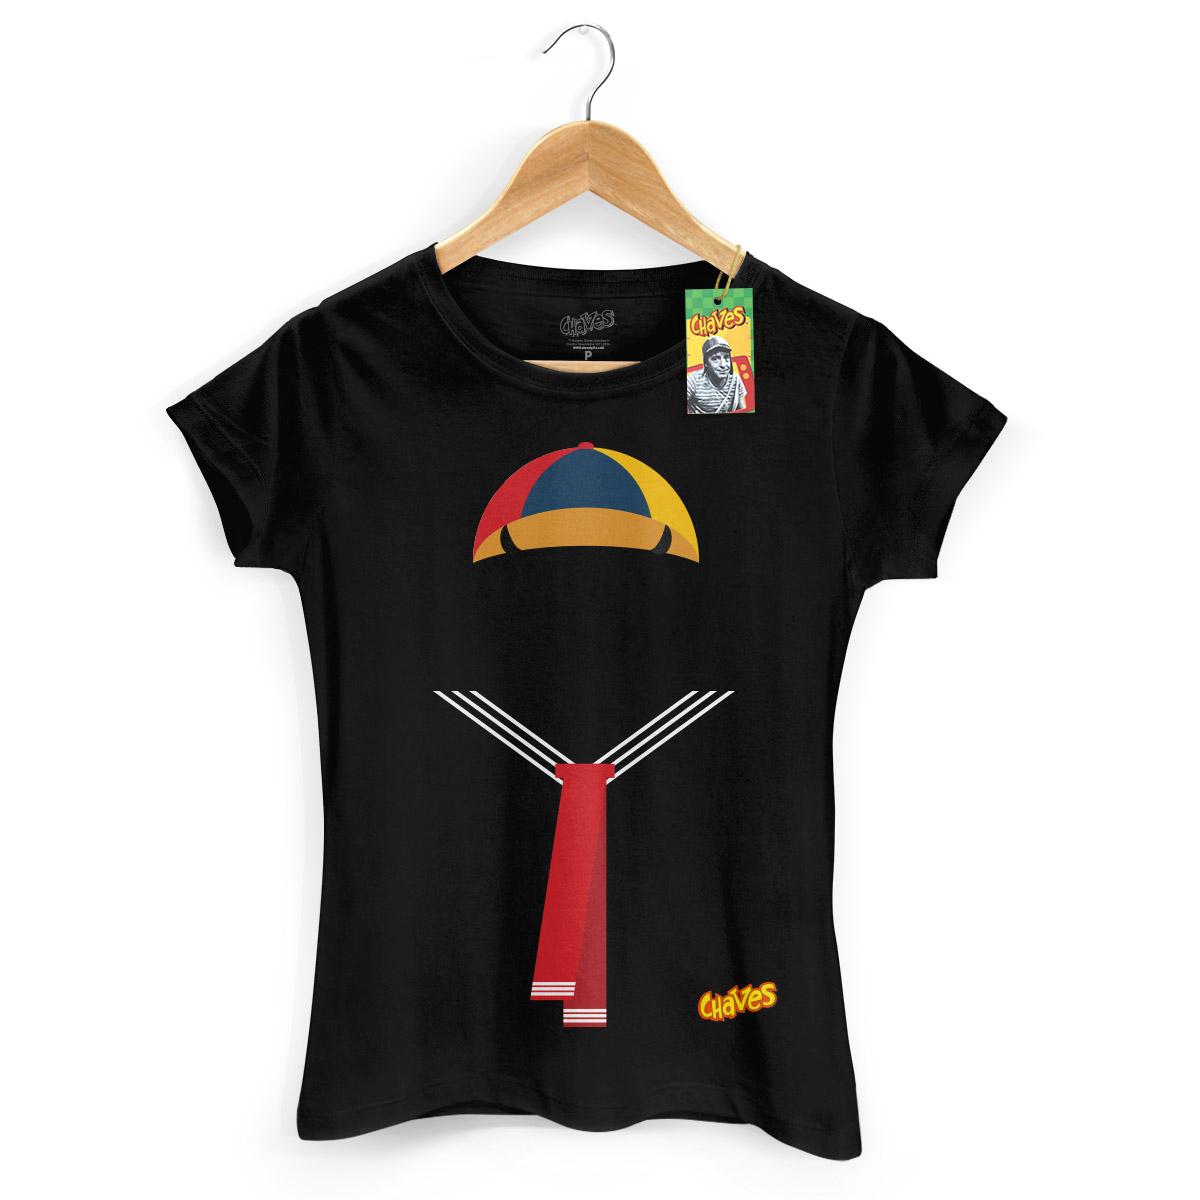 Camiseta Feminina Roupa do Quico